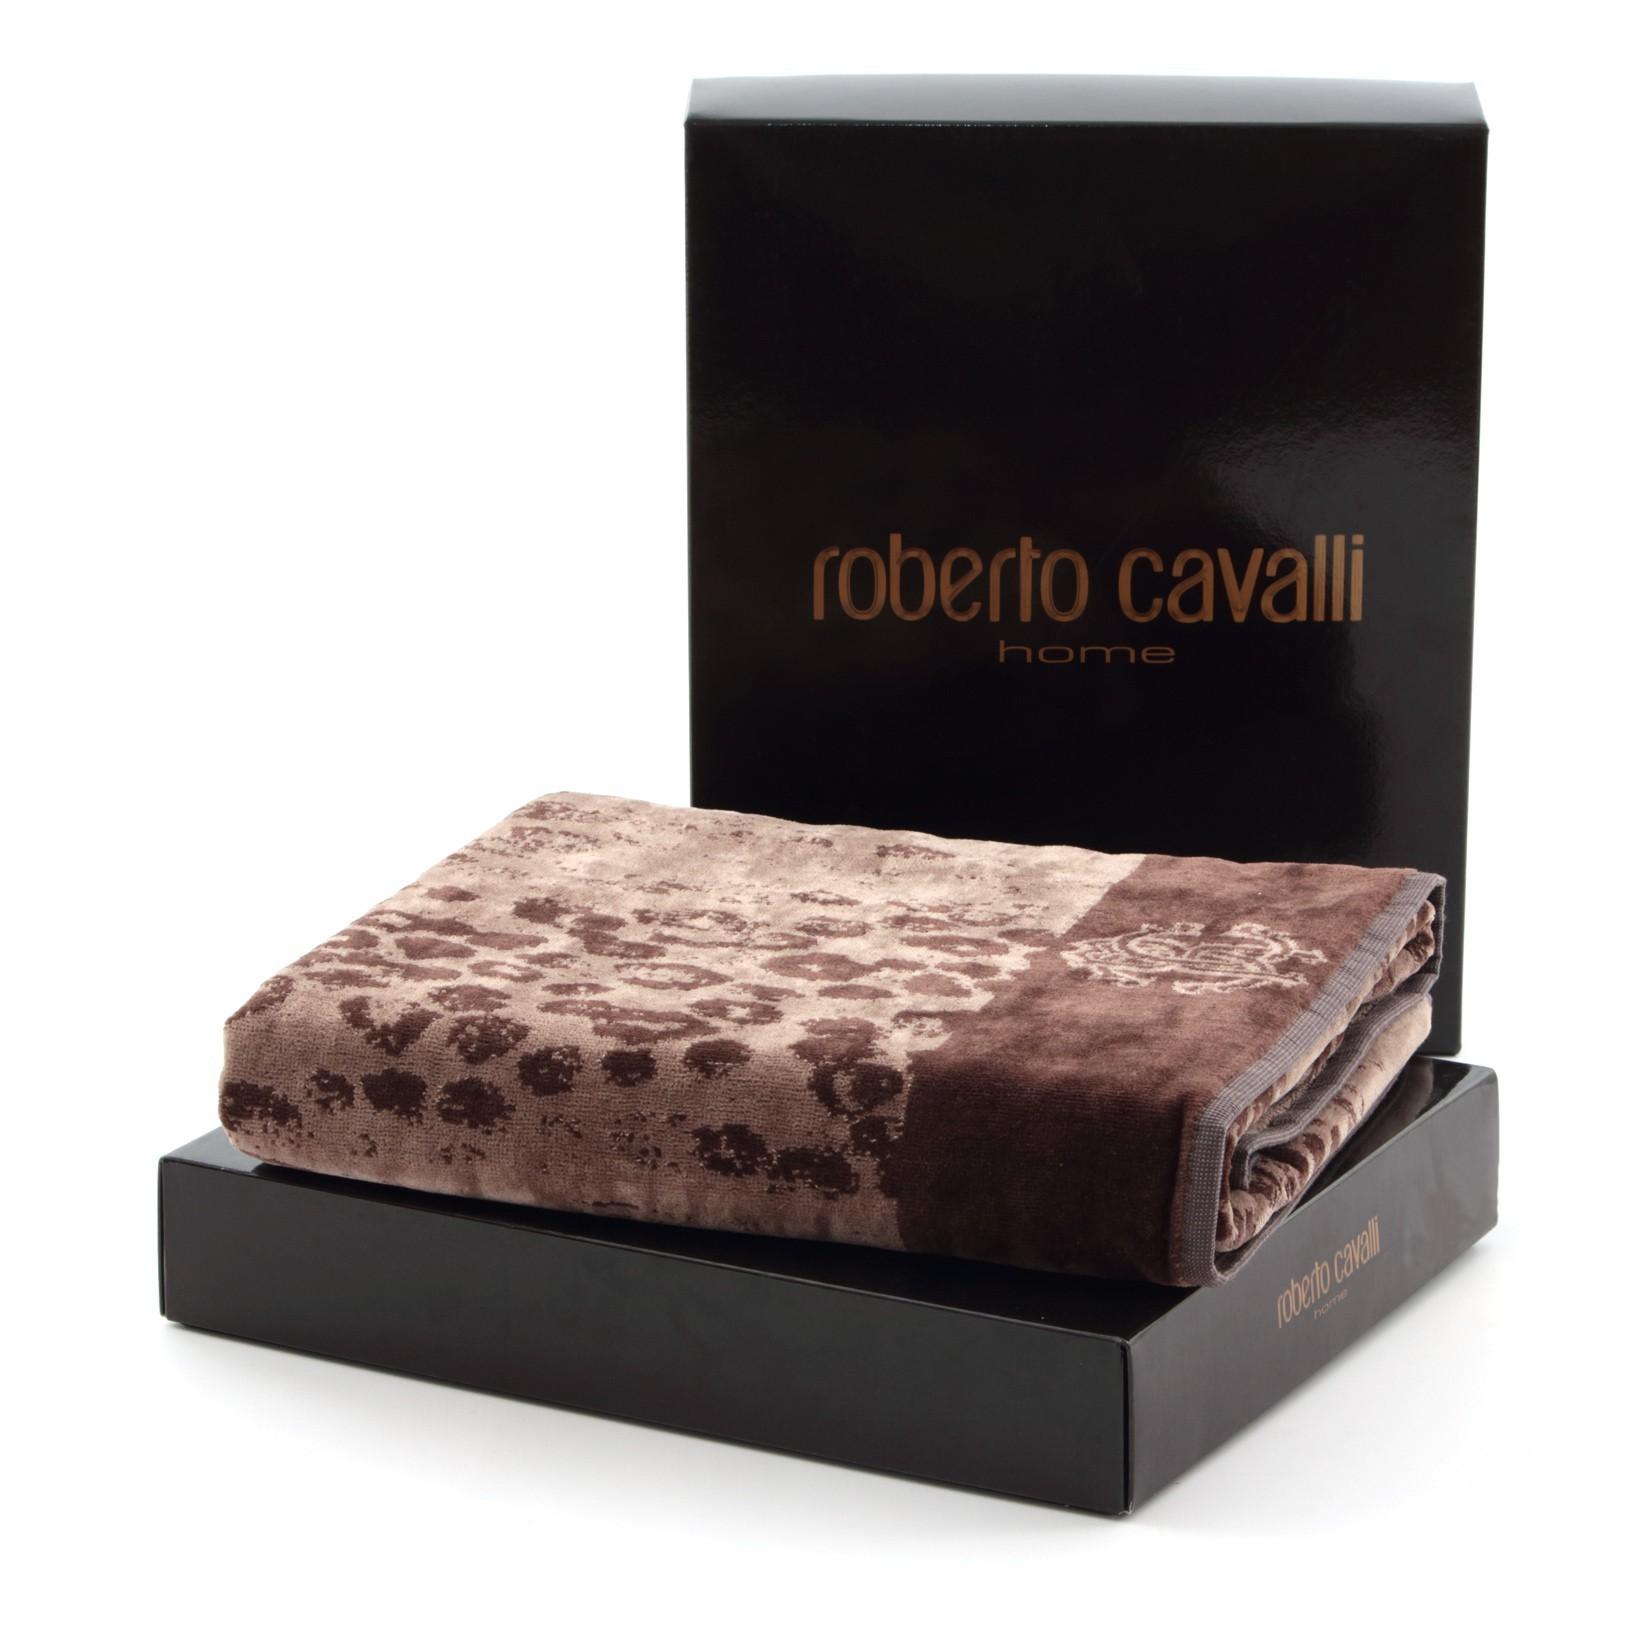 Наборы полотенец Набор полотенец 2 шт Roberto Cavalli Giaguaro коричневый elitnye-polotentsa-velyurovye-giaguaro-korichnevye-ot-roberto-cavalli-italiya-vid-s-upakovkoy.jpg